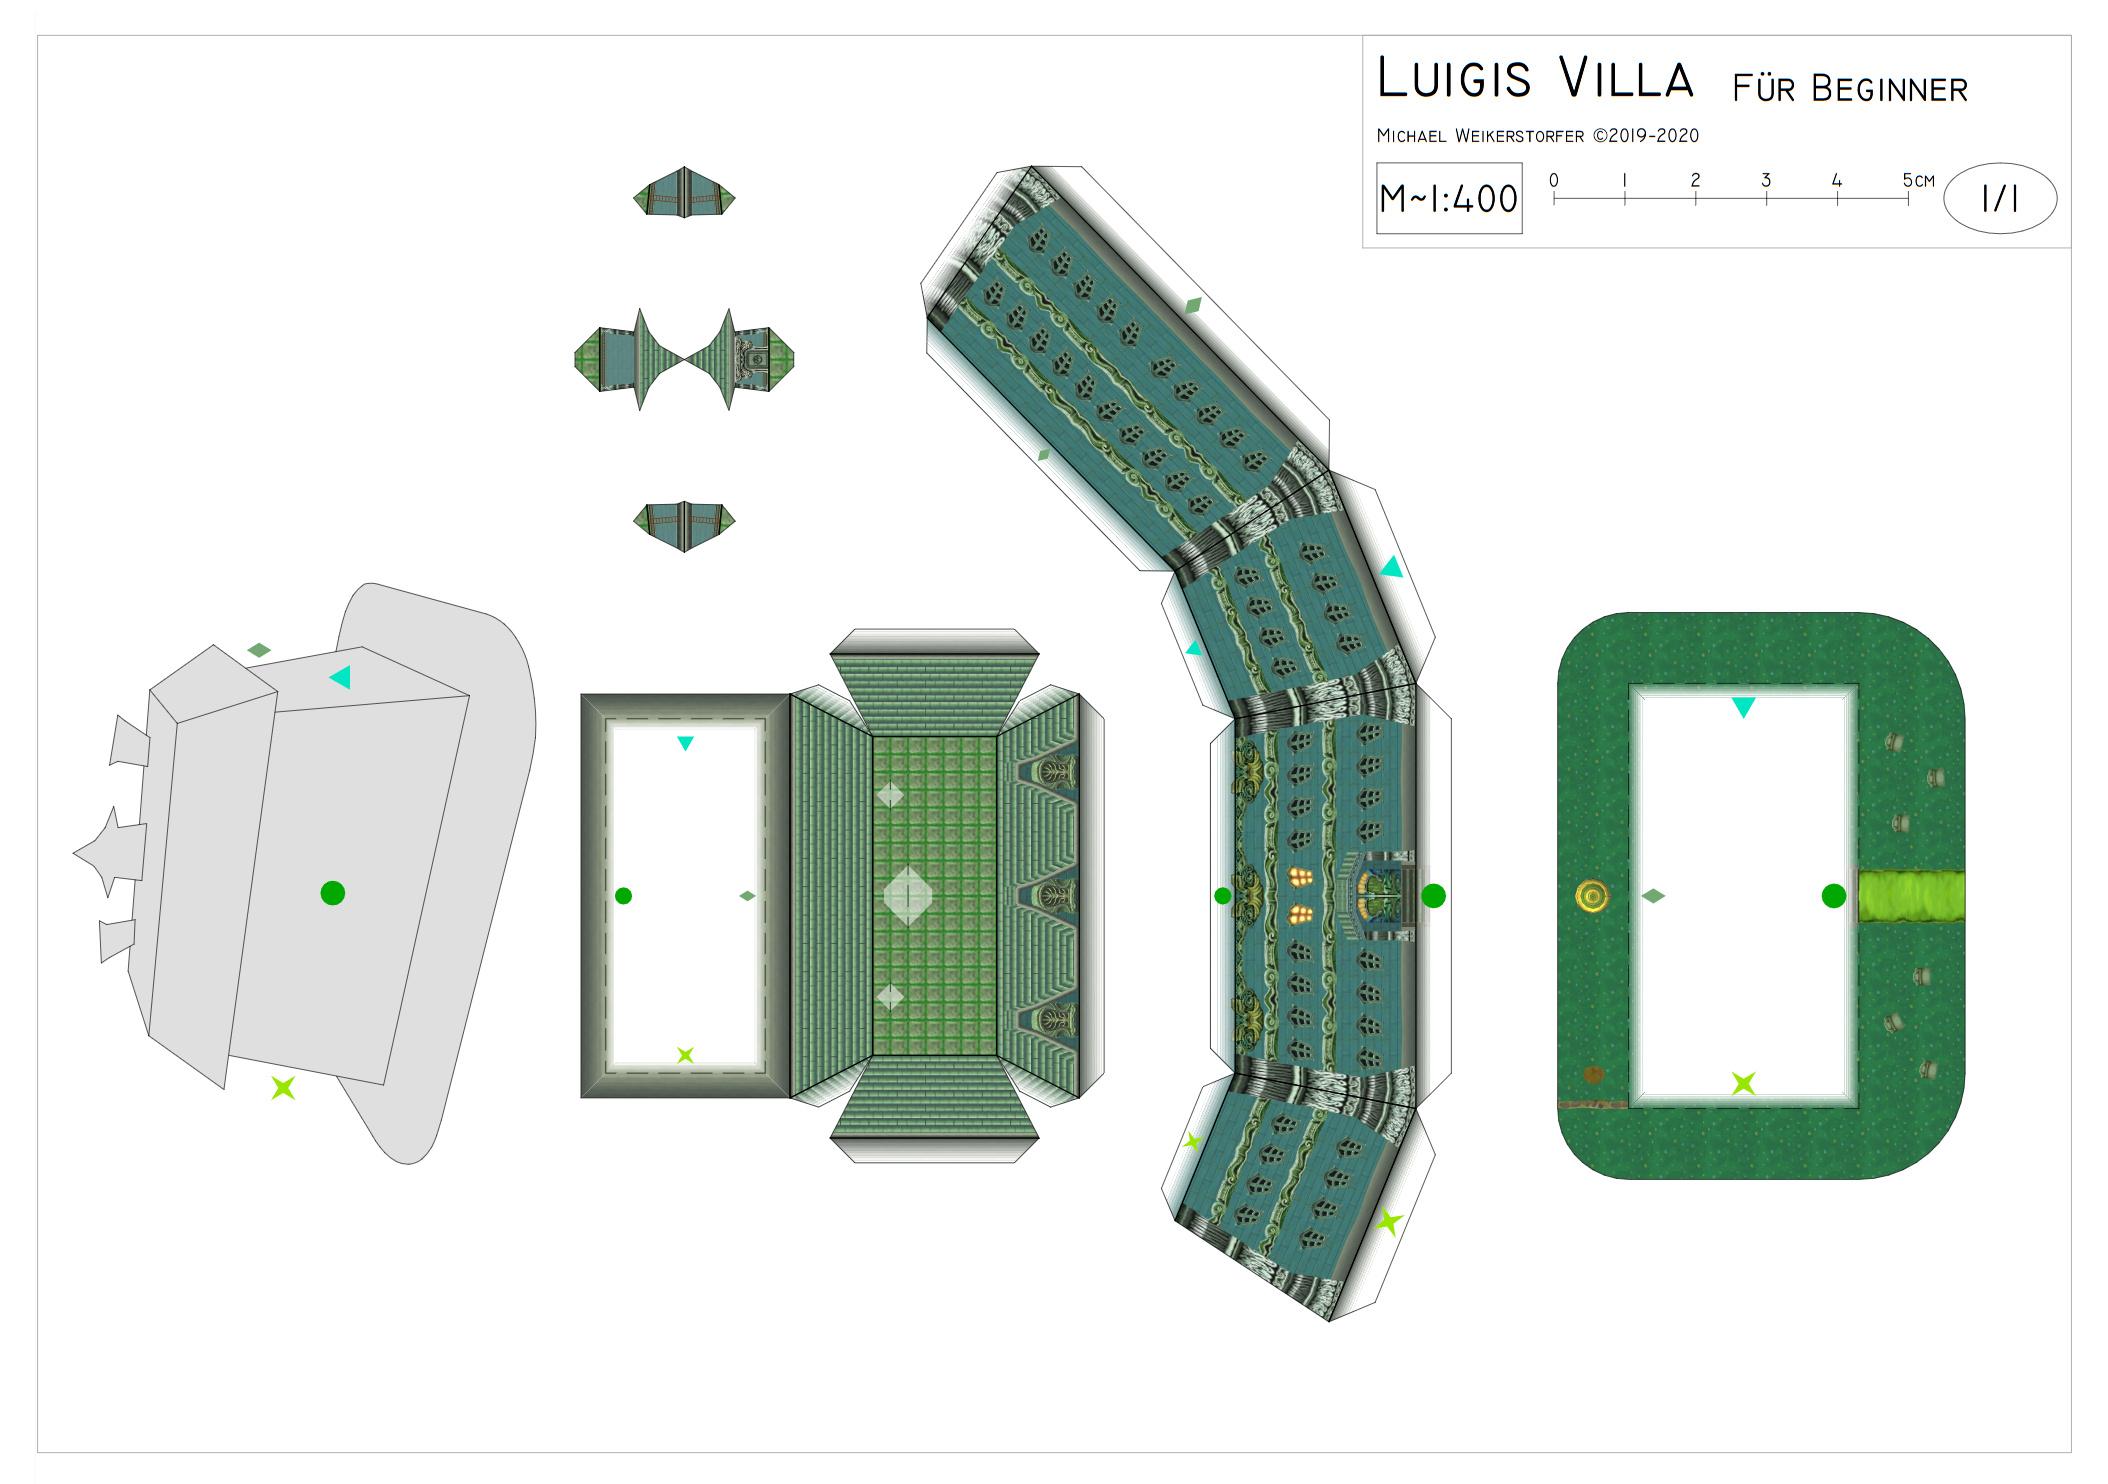 Luigi's Mansion - Die Gruselvilla aus dem Gamecube-Klassiker Luigis13